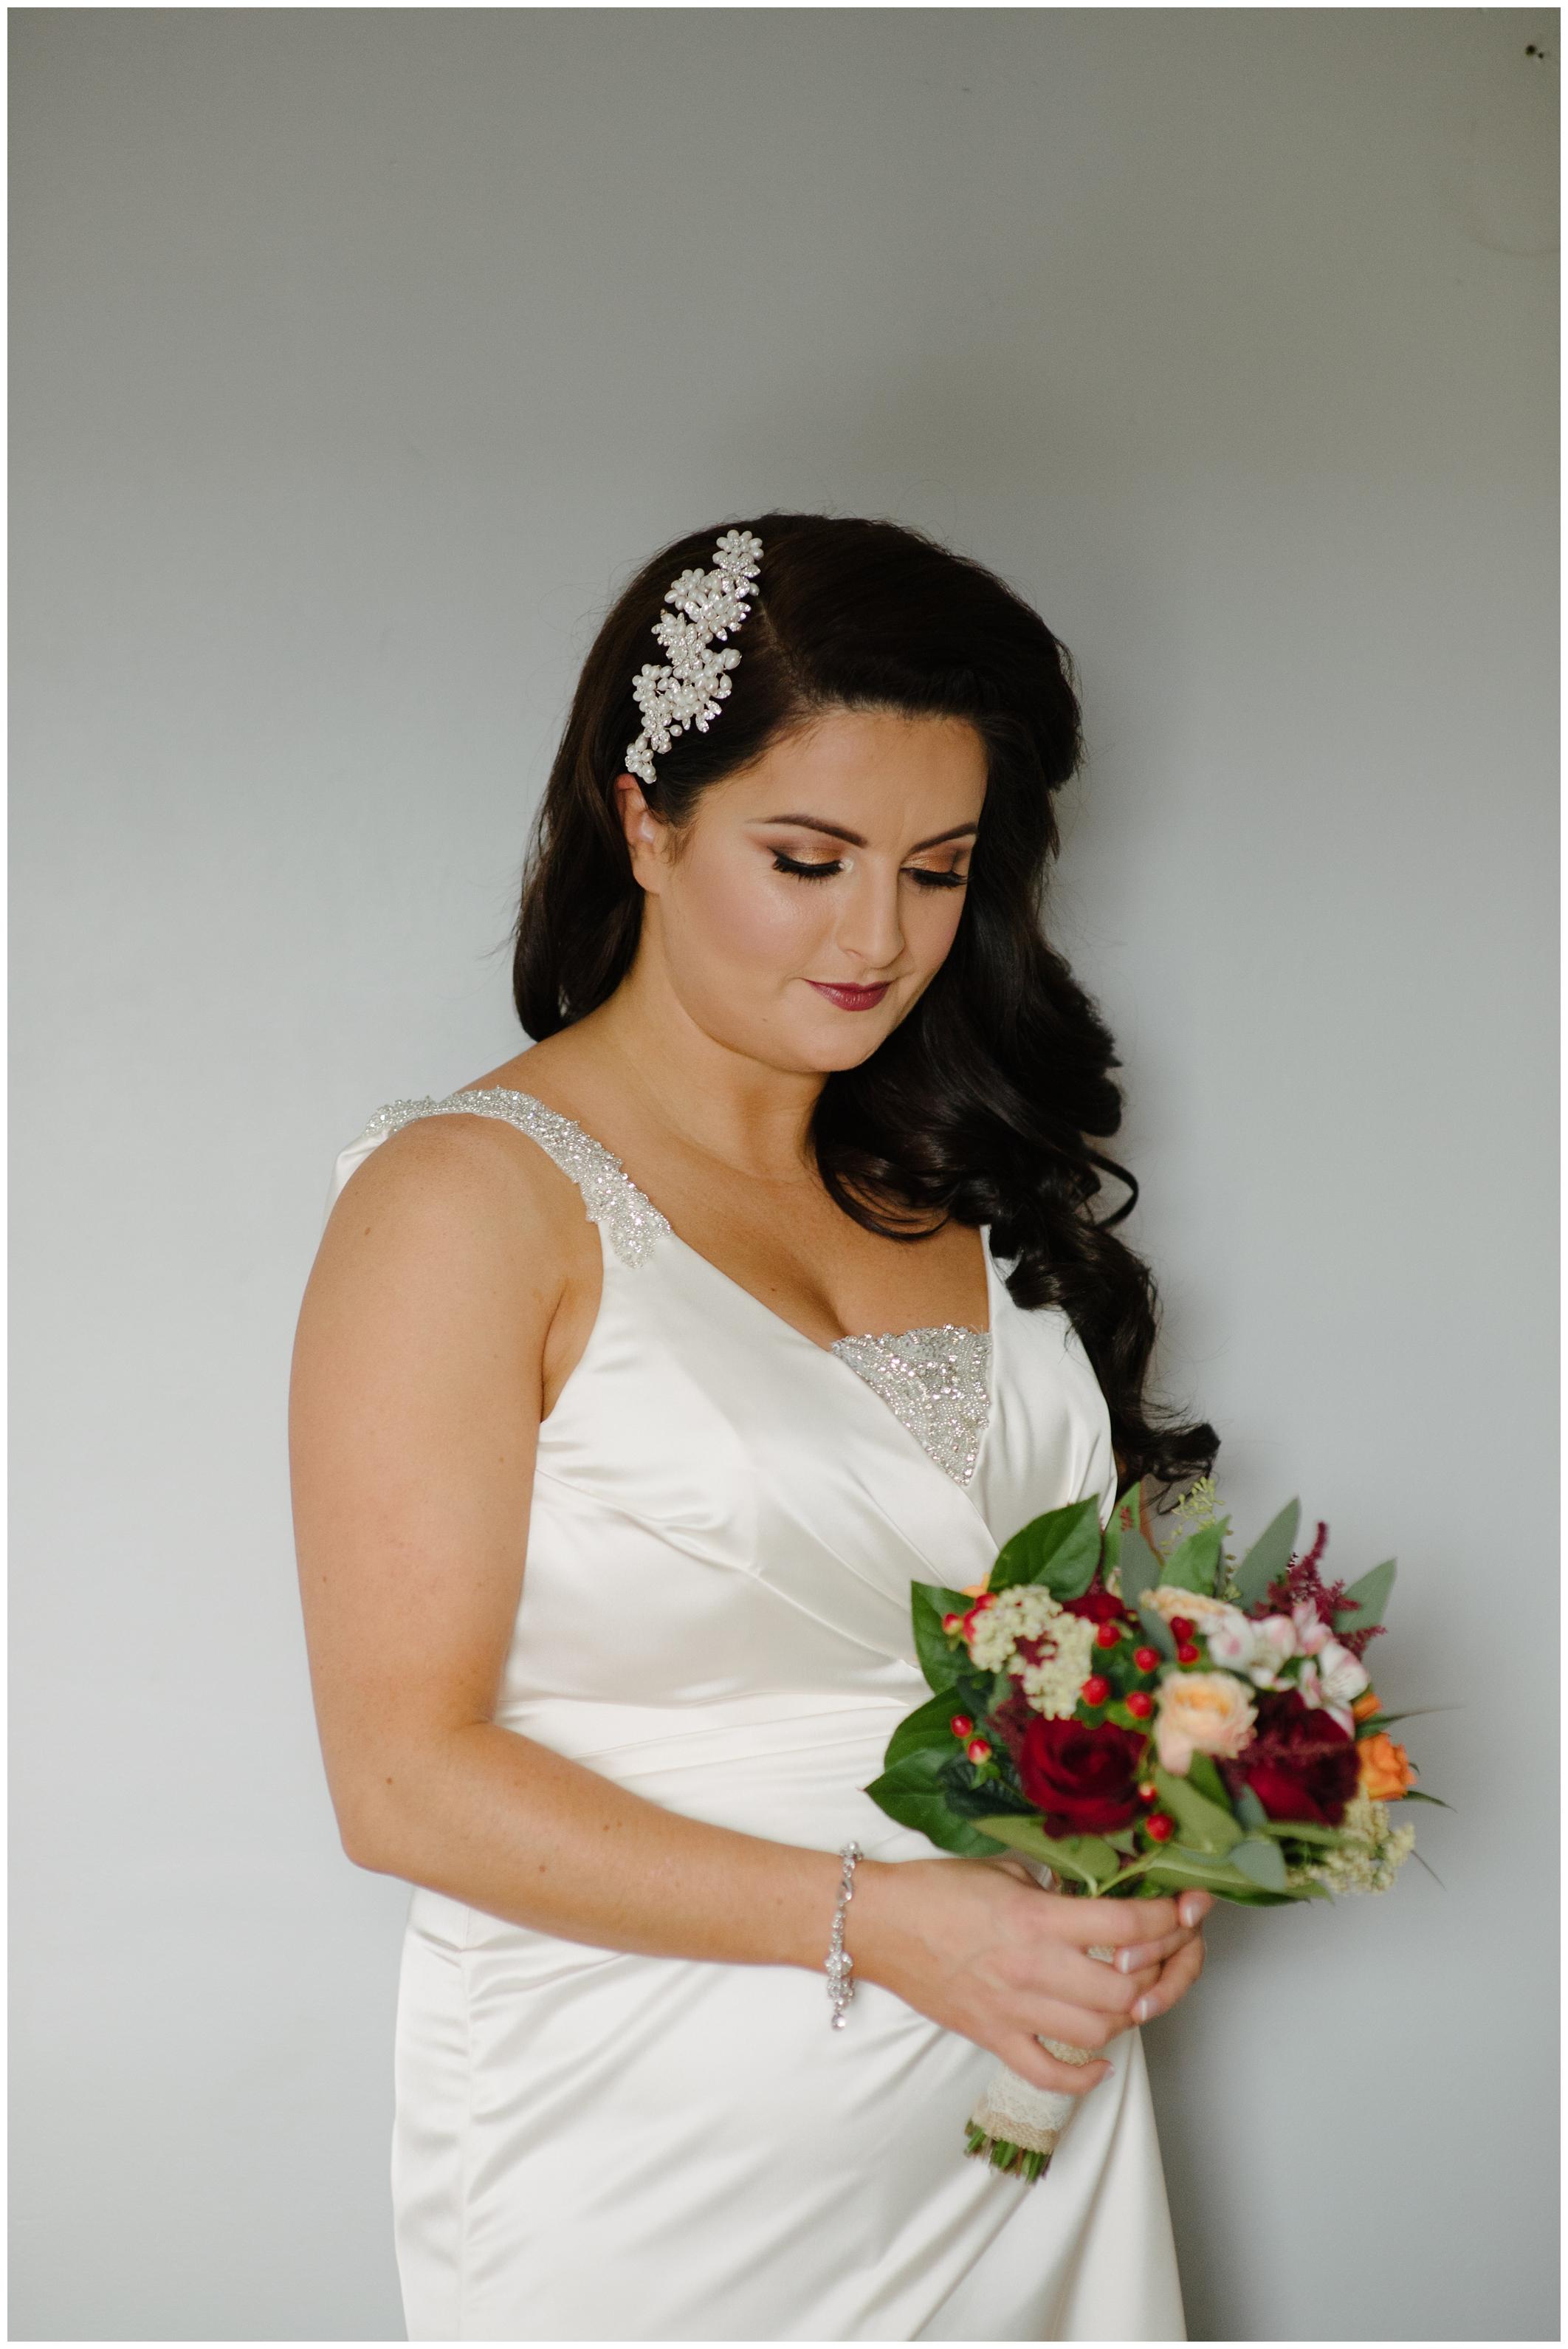 tracey_conor__wedding_jude_browne_photography_0010.jpg